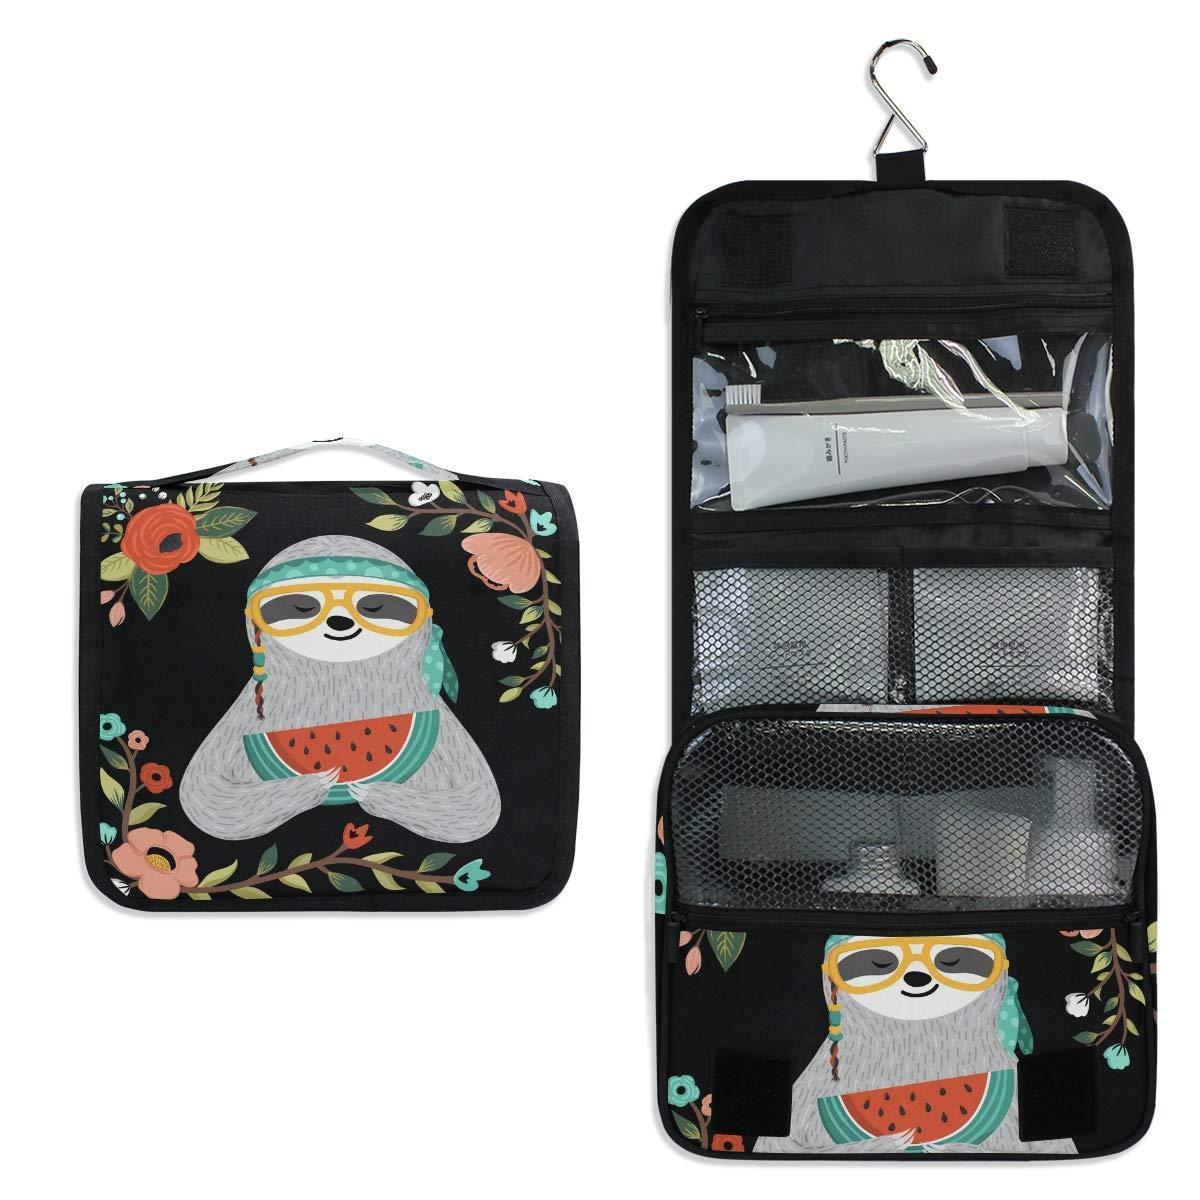 JOYPRINT Hanging Toiletry Bag Flower Sloth Animal Watermelon, Makeup Bag Cosmetic Bag Bathroom Travel Organizer Large for Women Girls